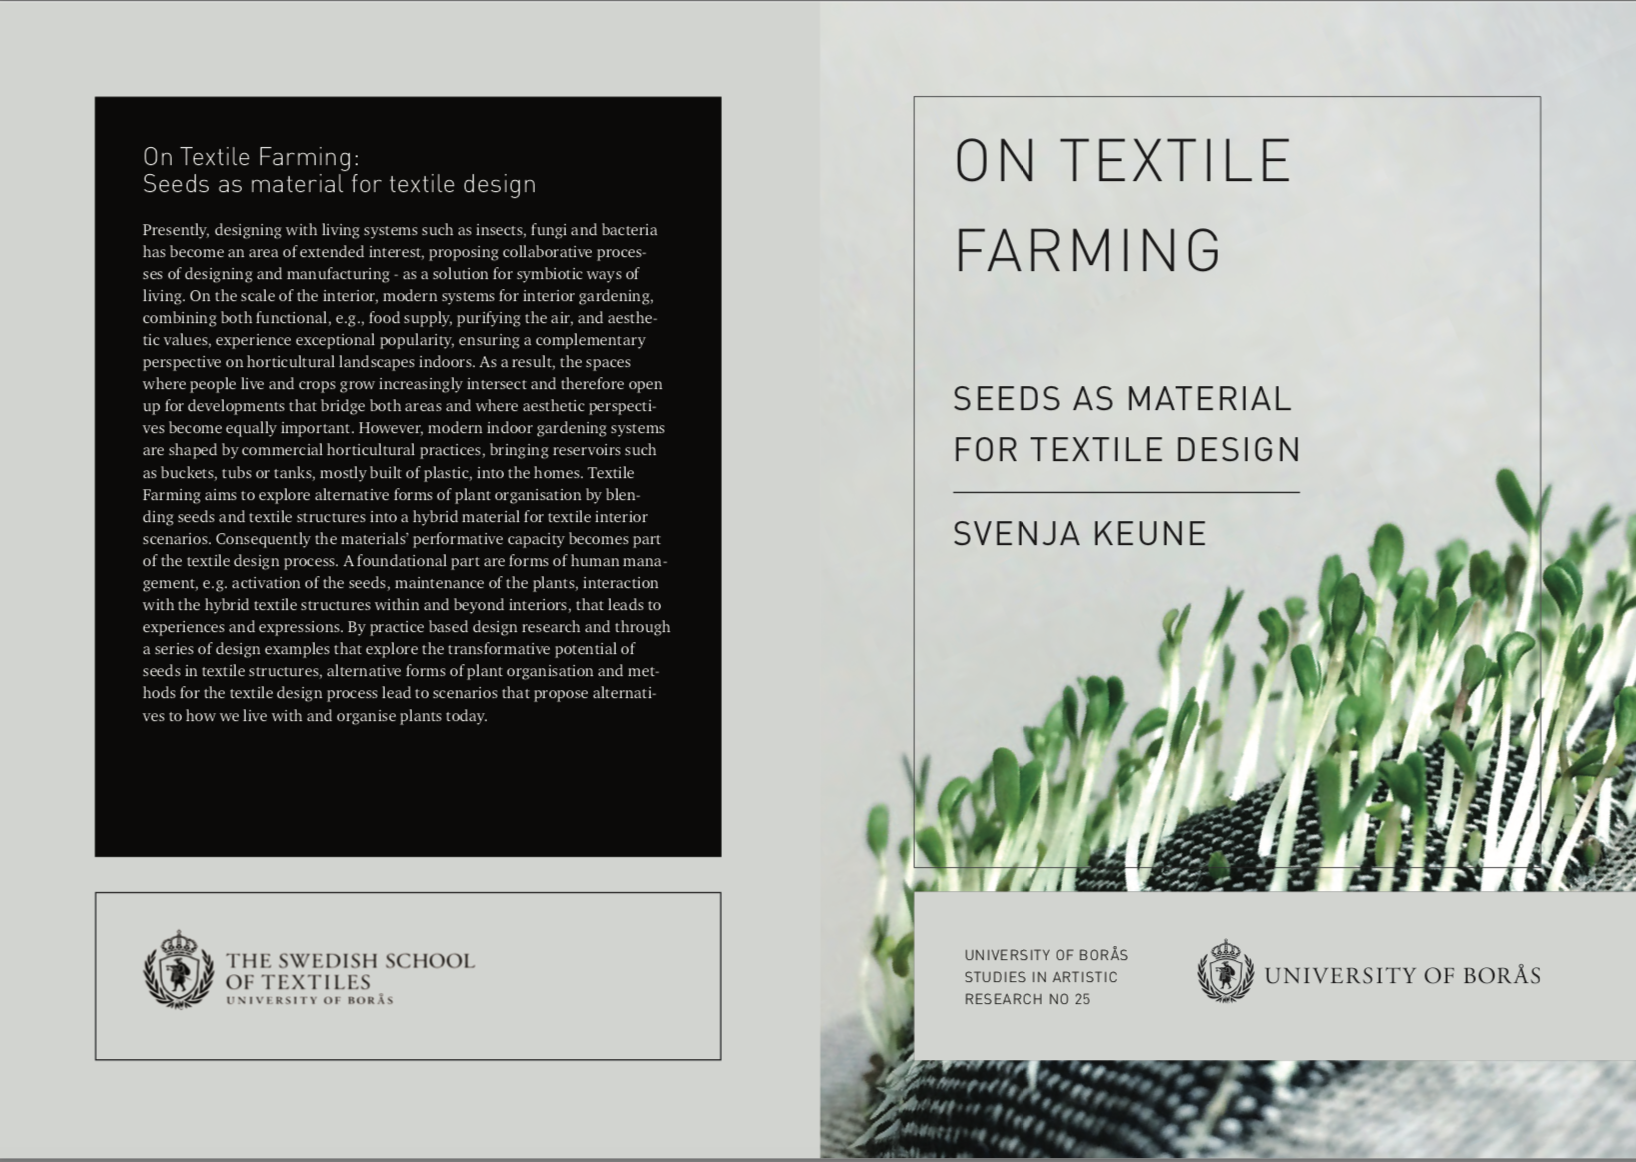 On Textile Farming: Seeds as Material for Textile Design_Svenja Keune